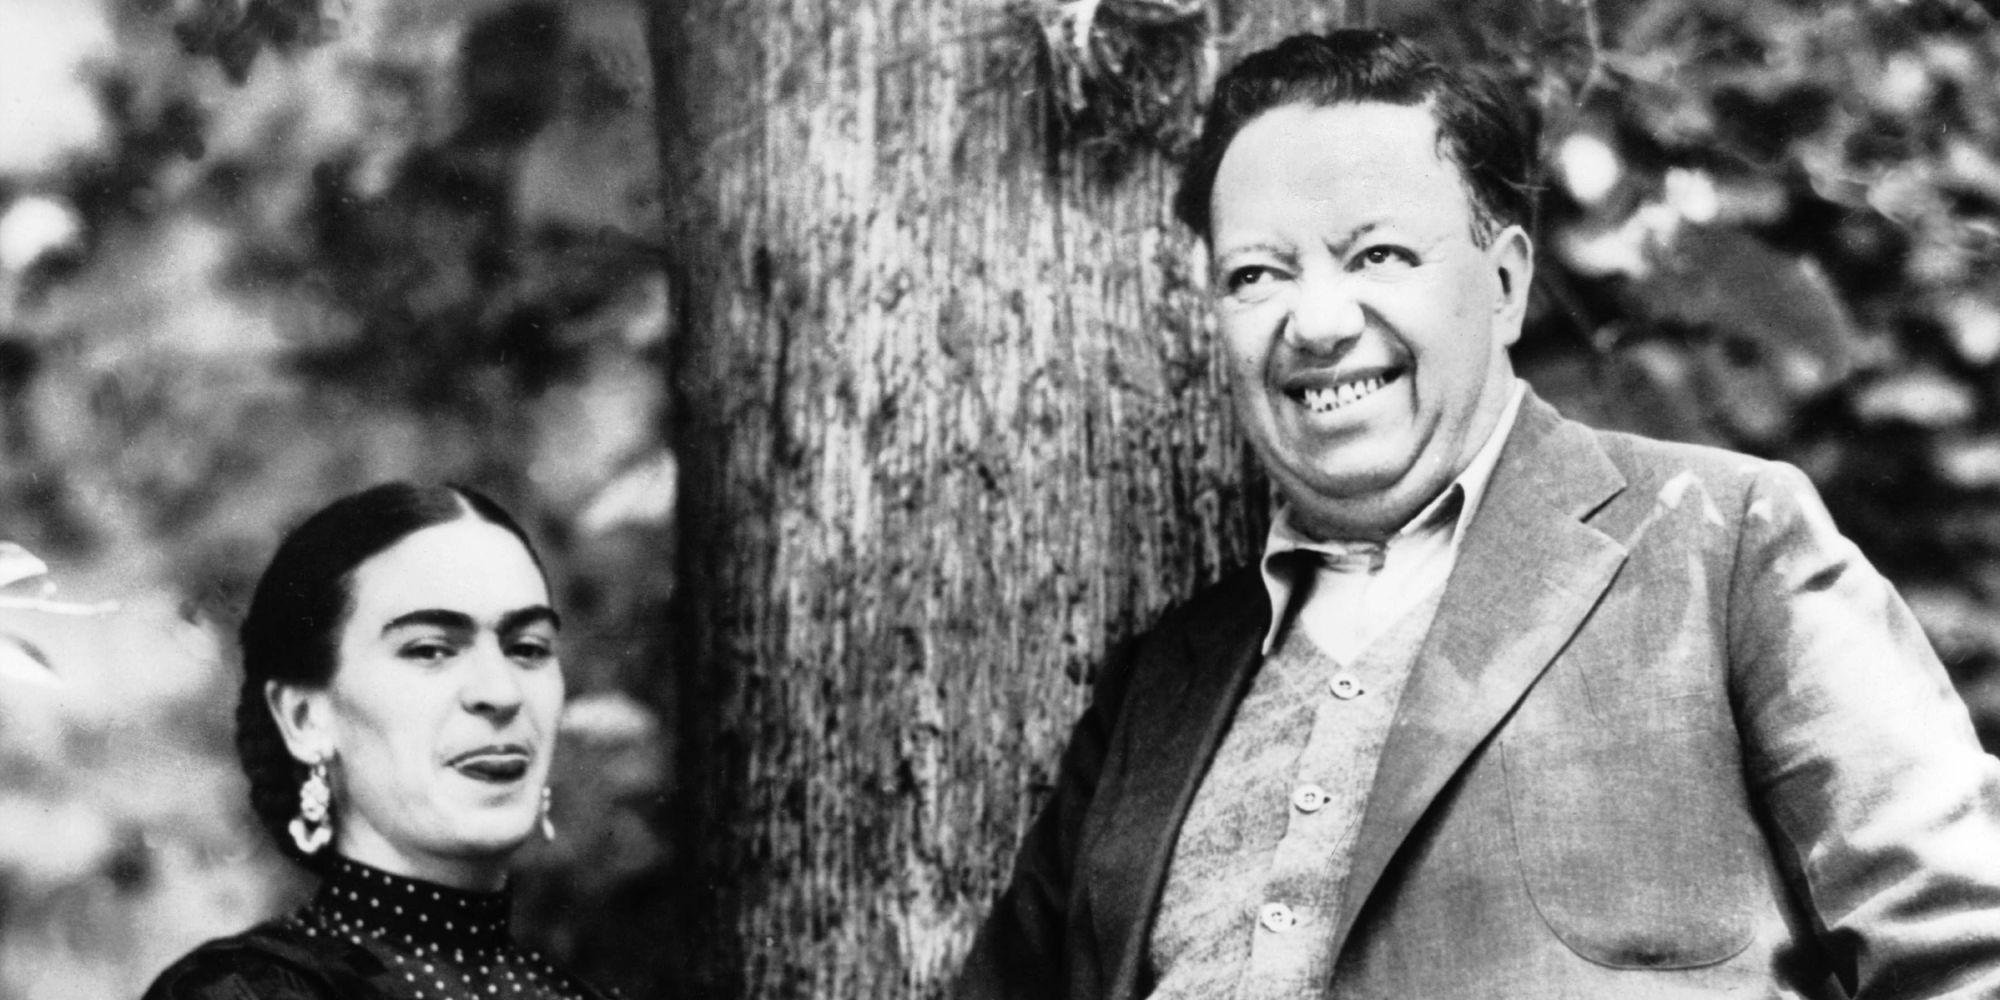 kahlo and rivera relationship